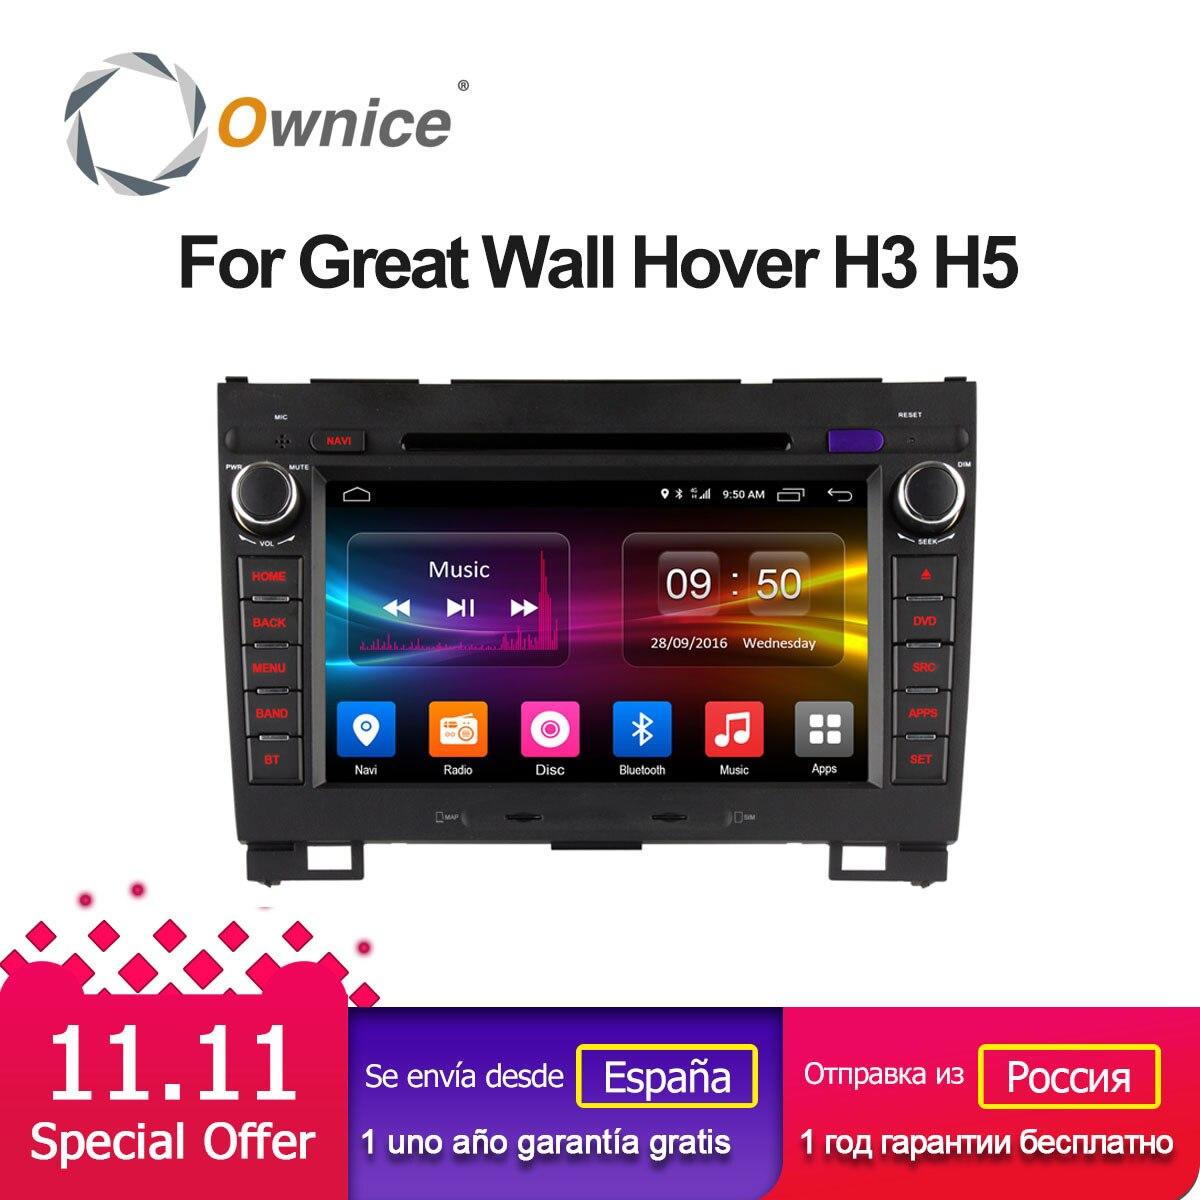 Ownice C500 Android 6.0 Octa 8 Core AUTO LETTORE DVD Navi GPS Per Great Wall Hover H3 H5 wifi 4g radio 2 gb di RAM 32 gb di ROM 4g LTE